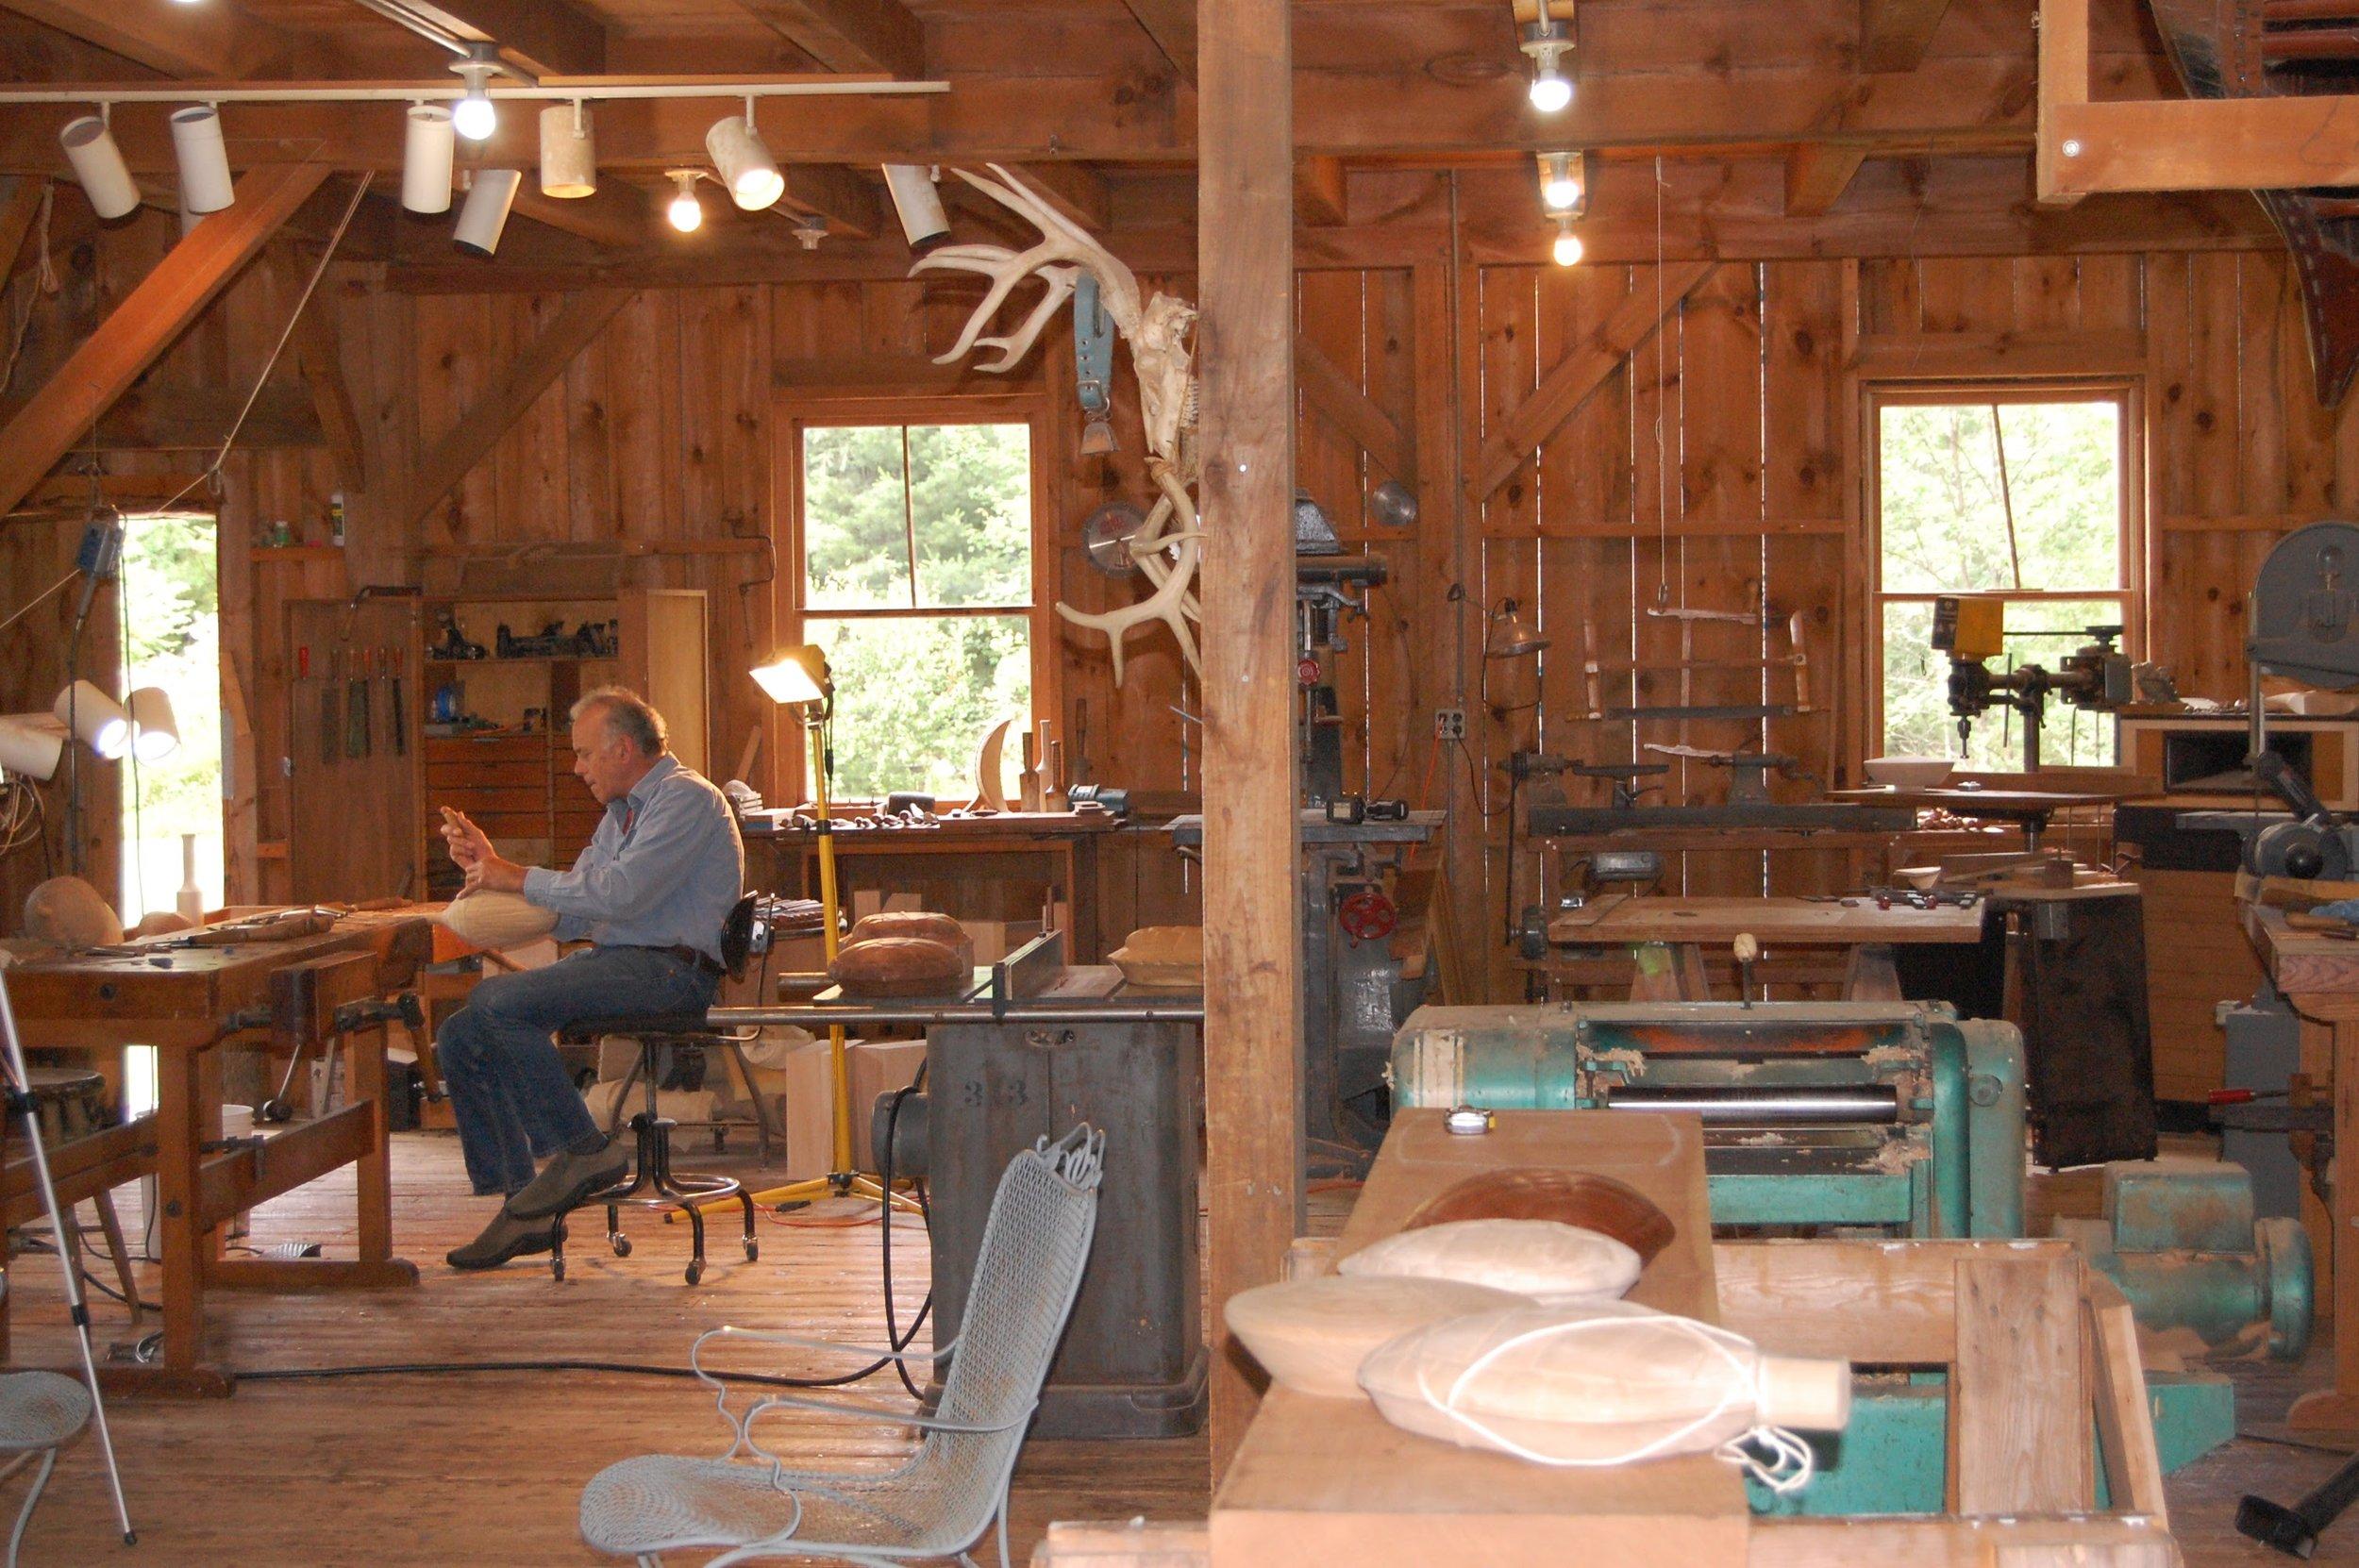 John Bryan at work, carving a chrysalis in his workshop.